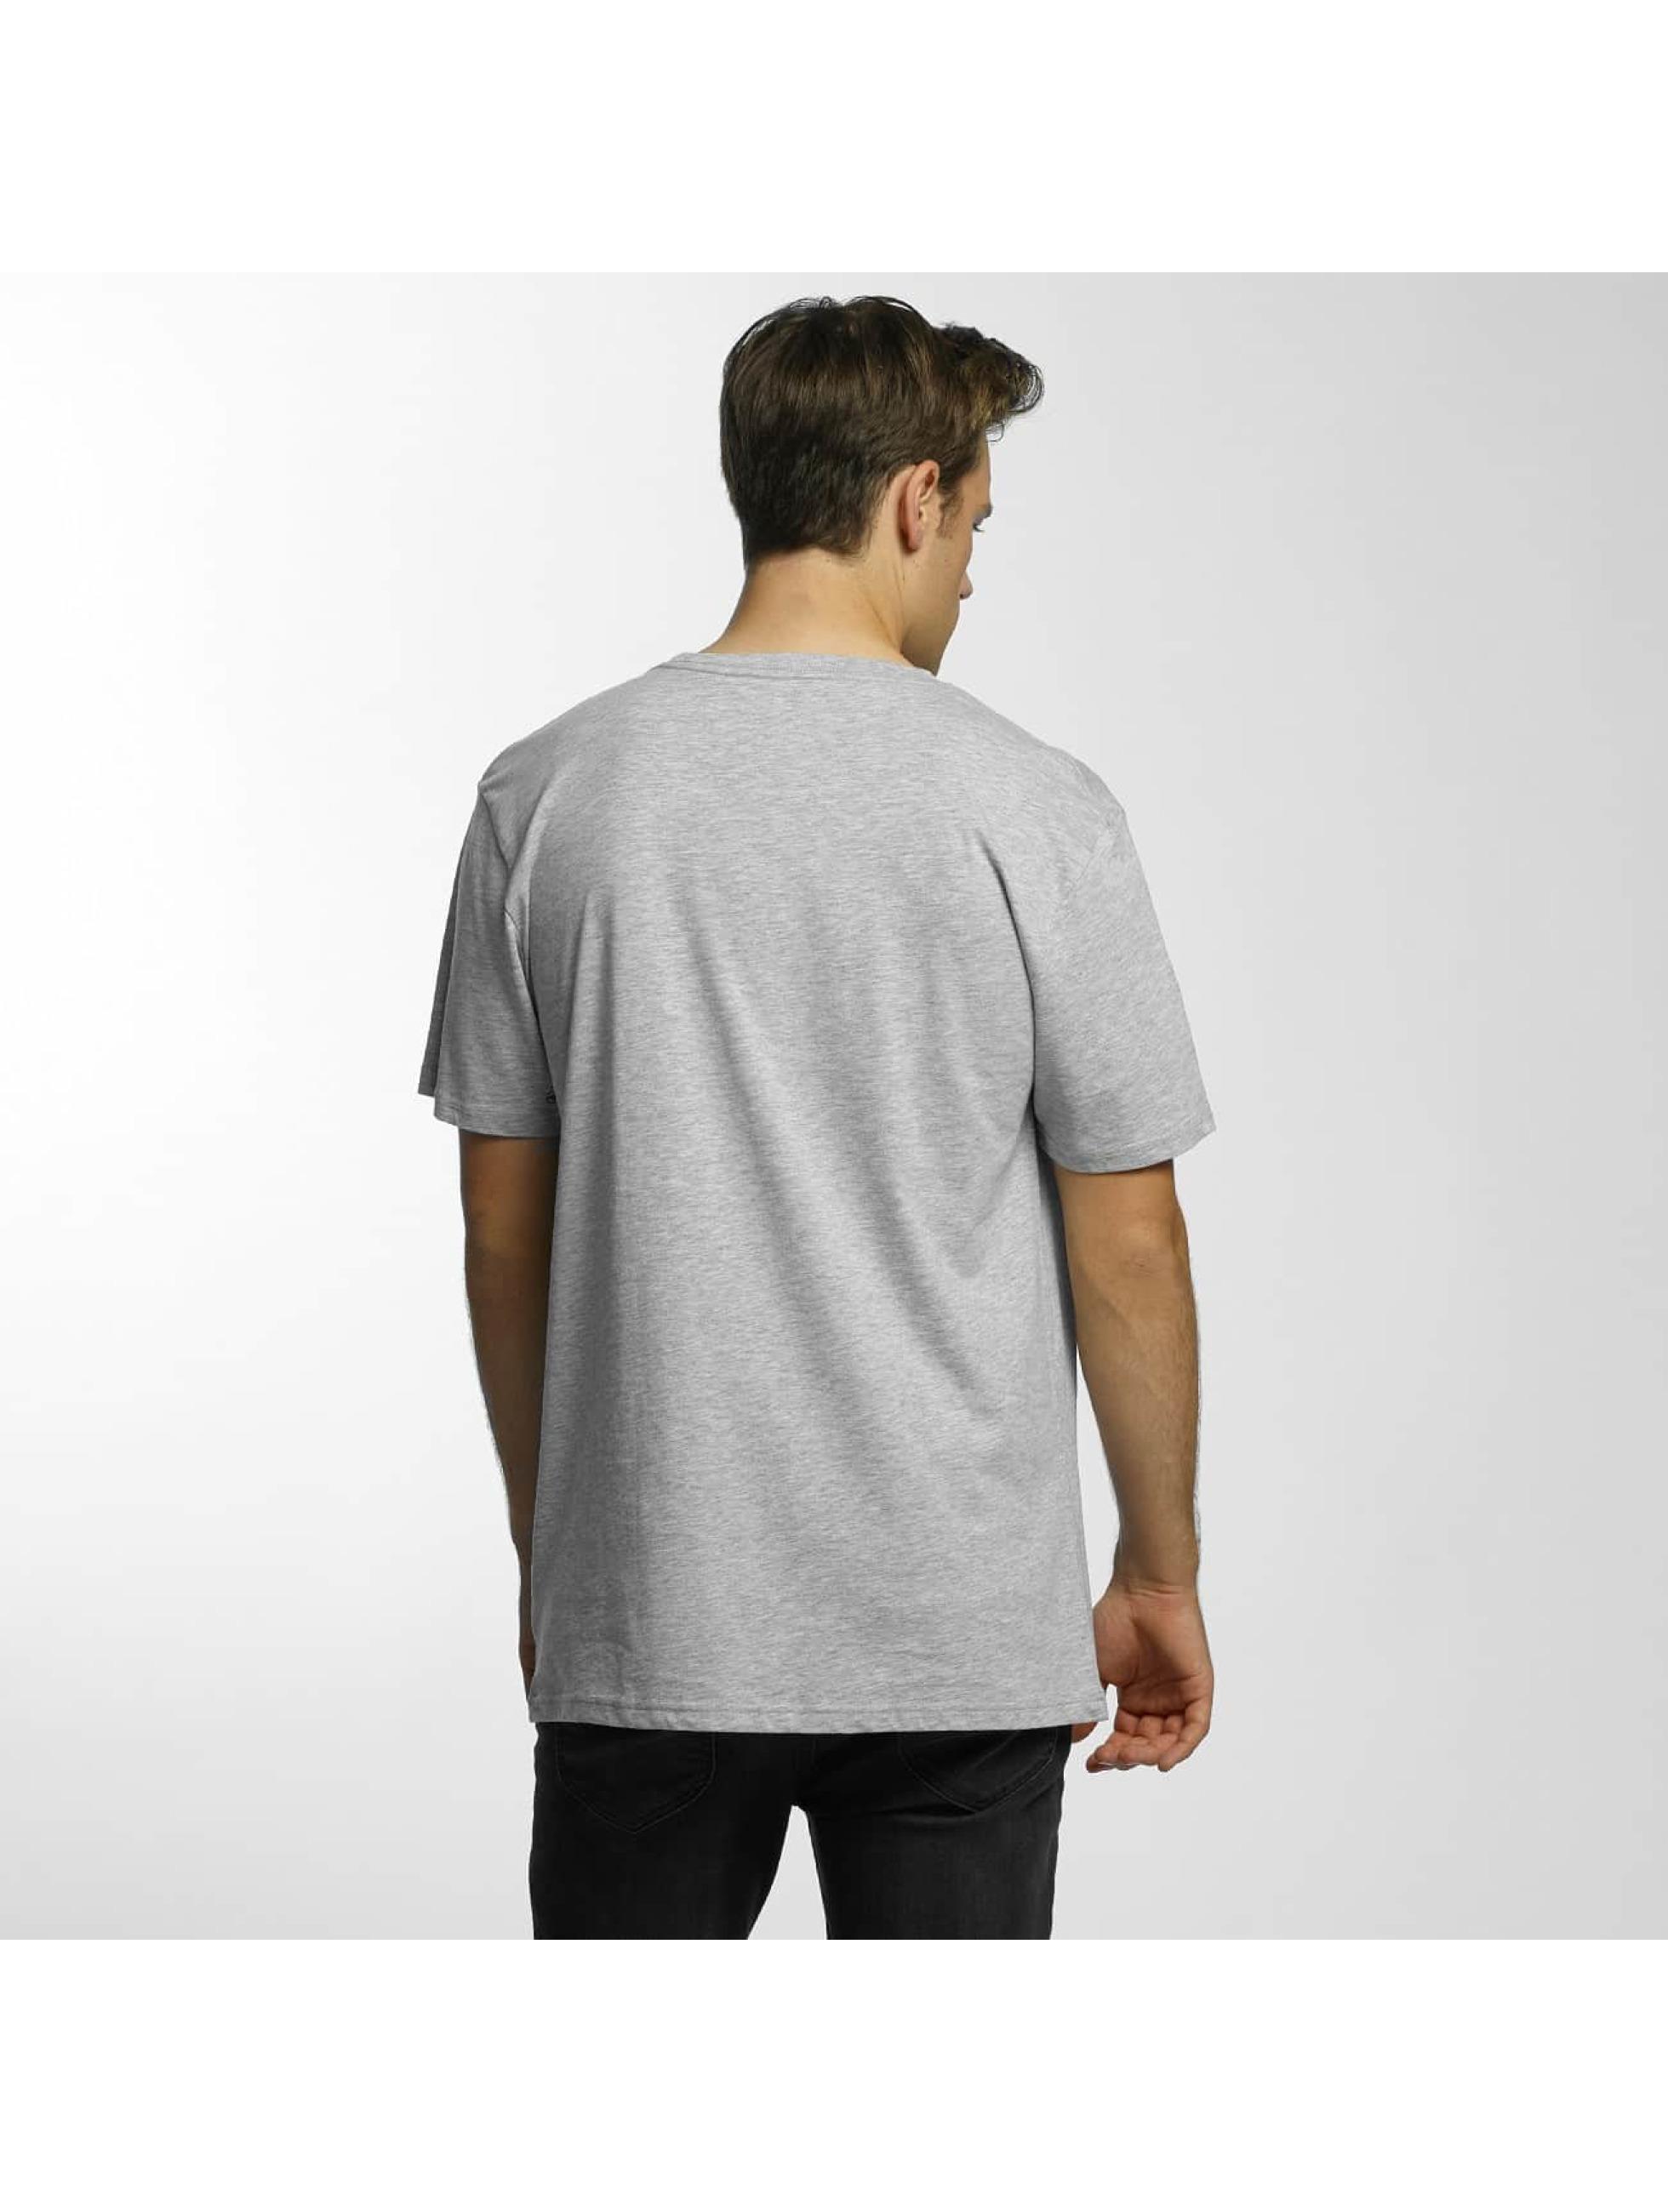 Volcom t-shirt Burnt Basic grijs